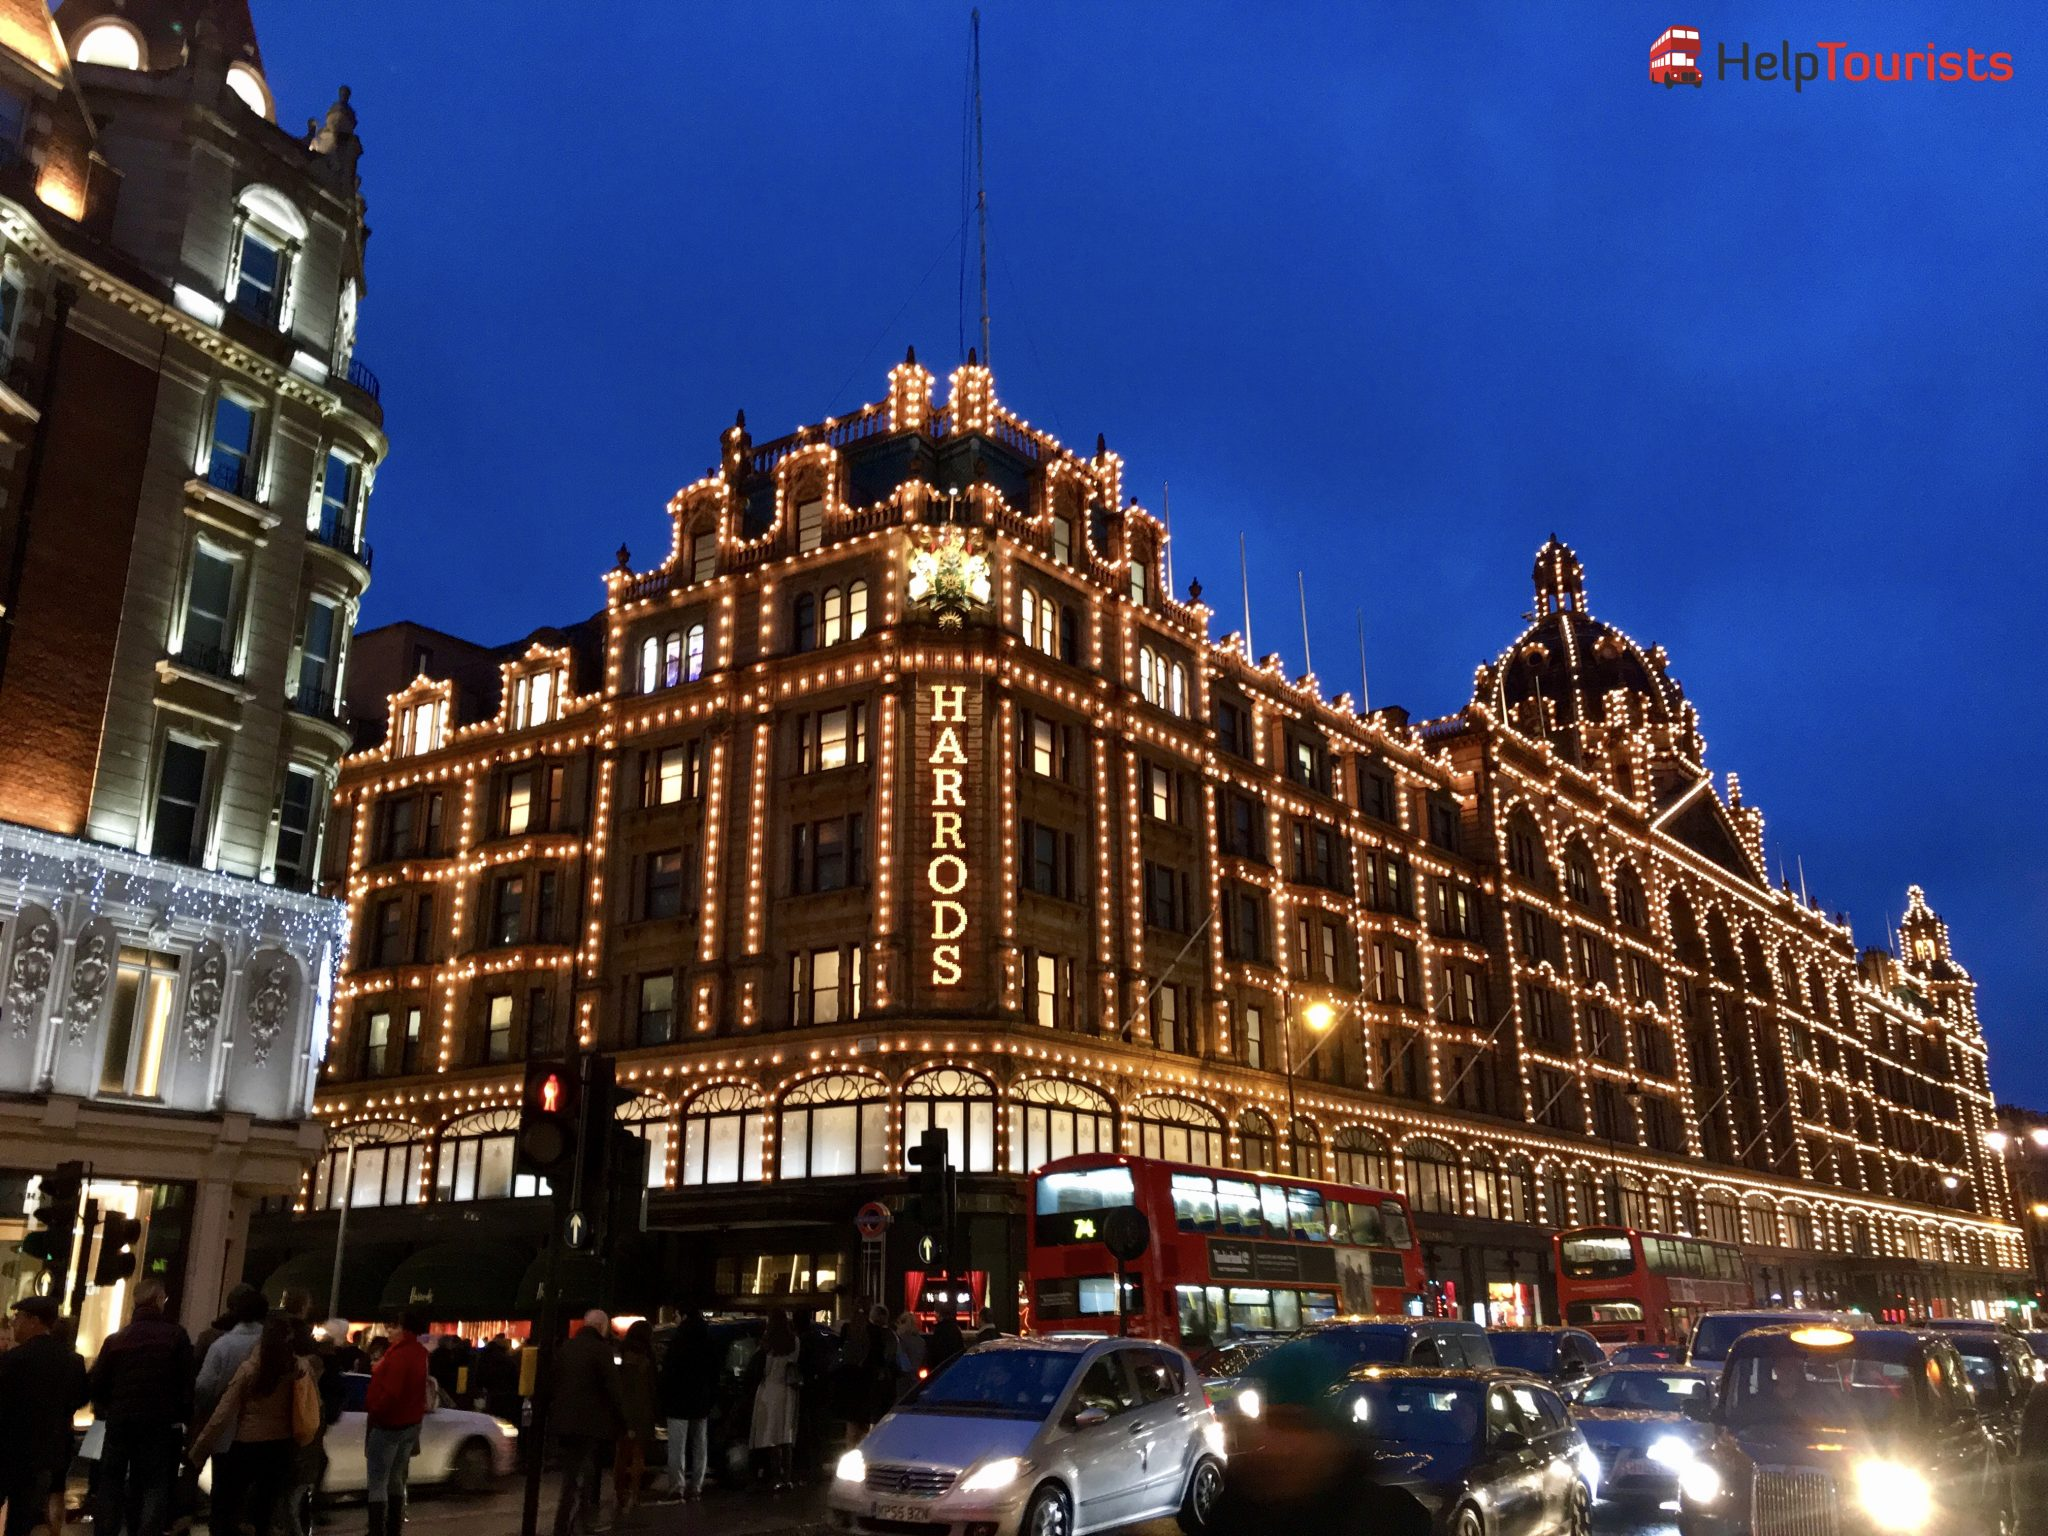 London Weihnachten Harrods Beleuchtung